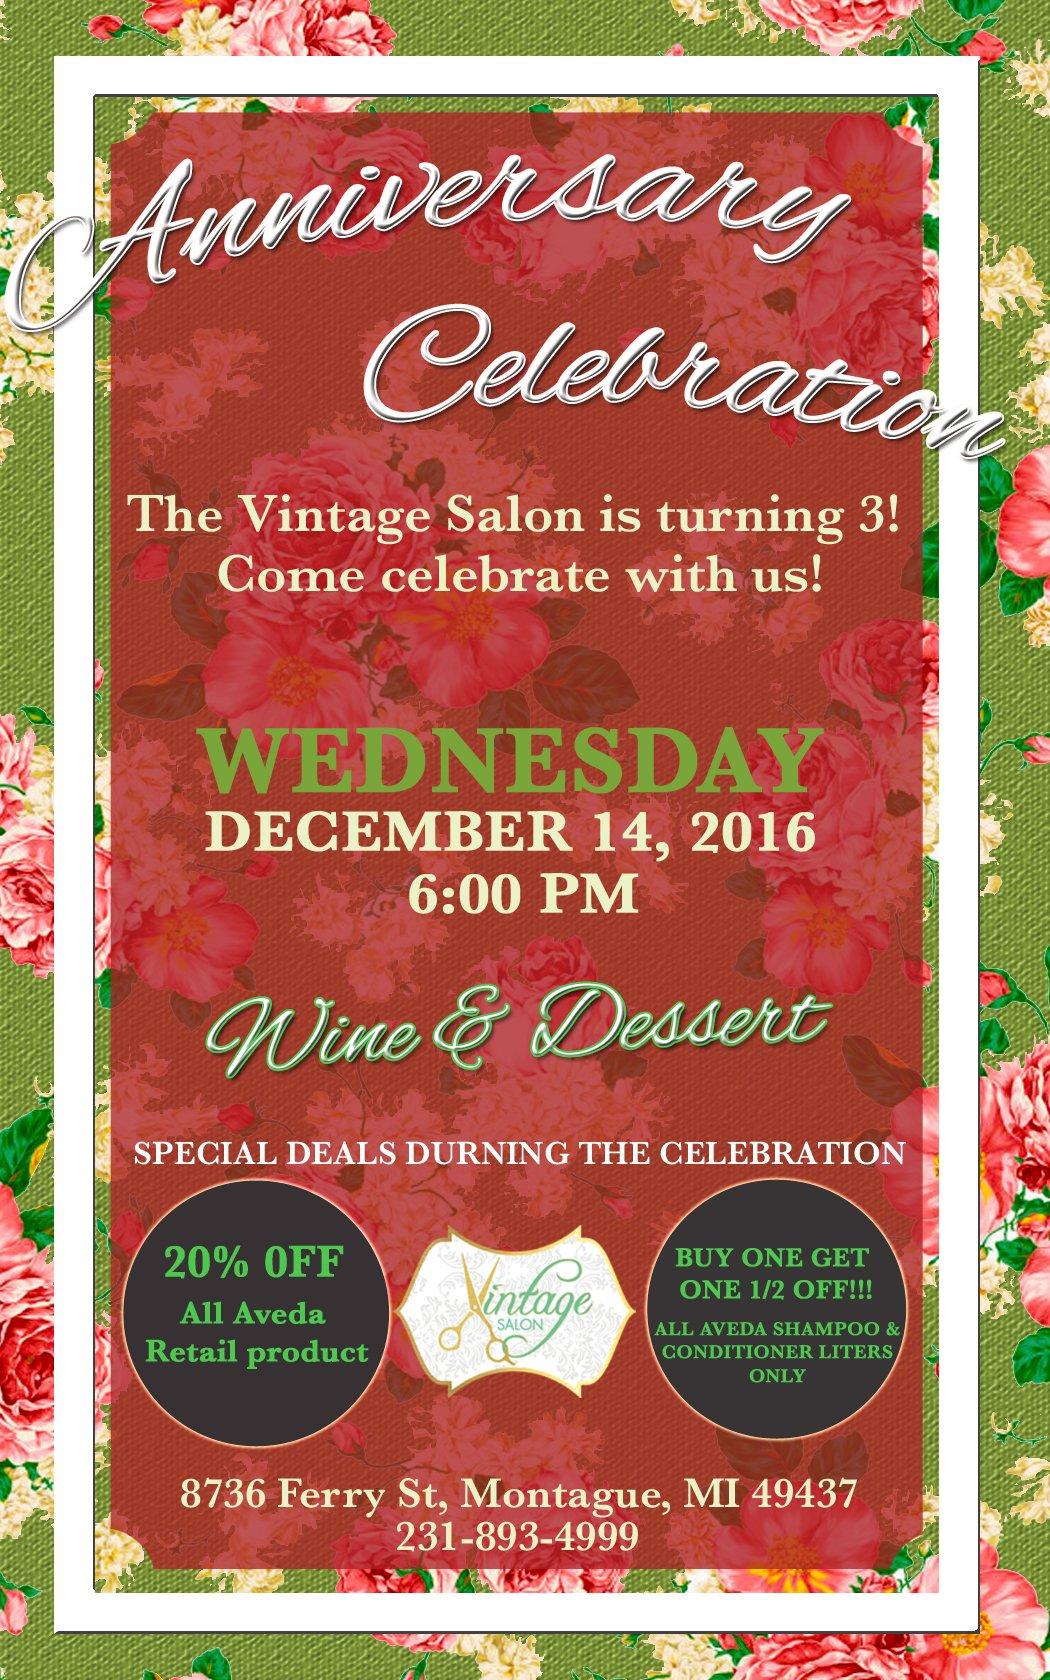 Dec 14 – The Vintage Salon Anniversary Celebration